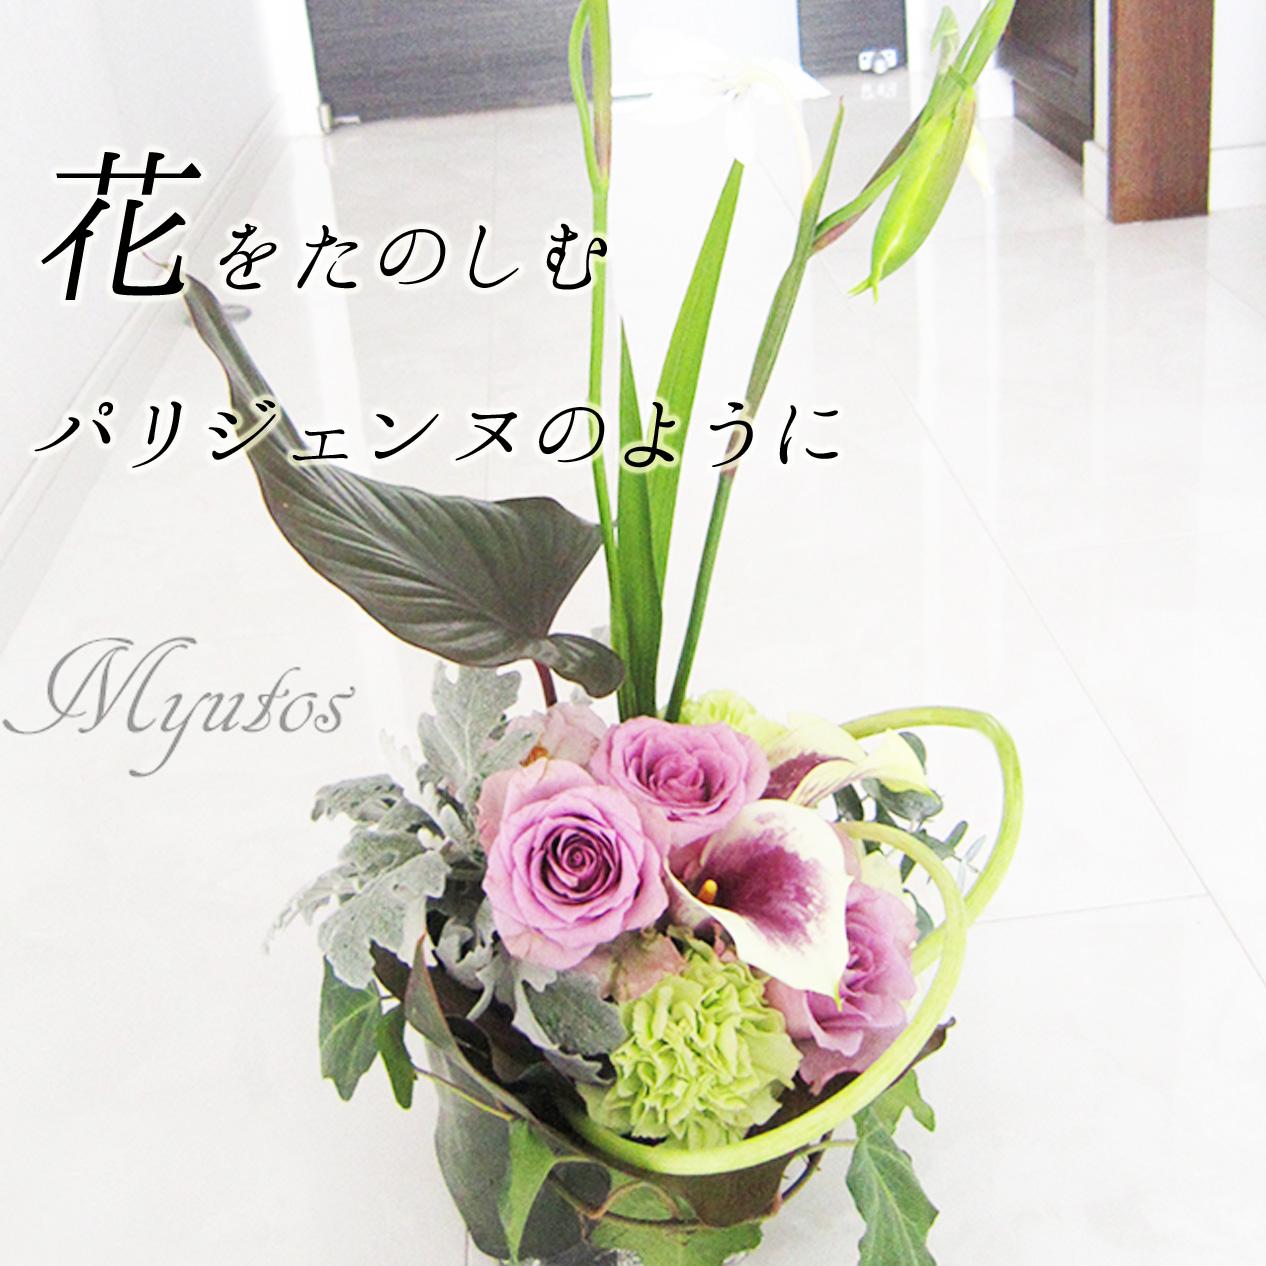 sp_image_2